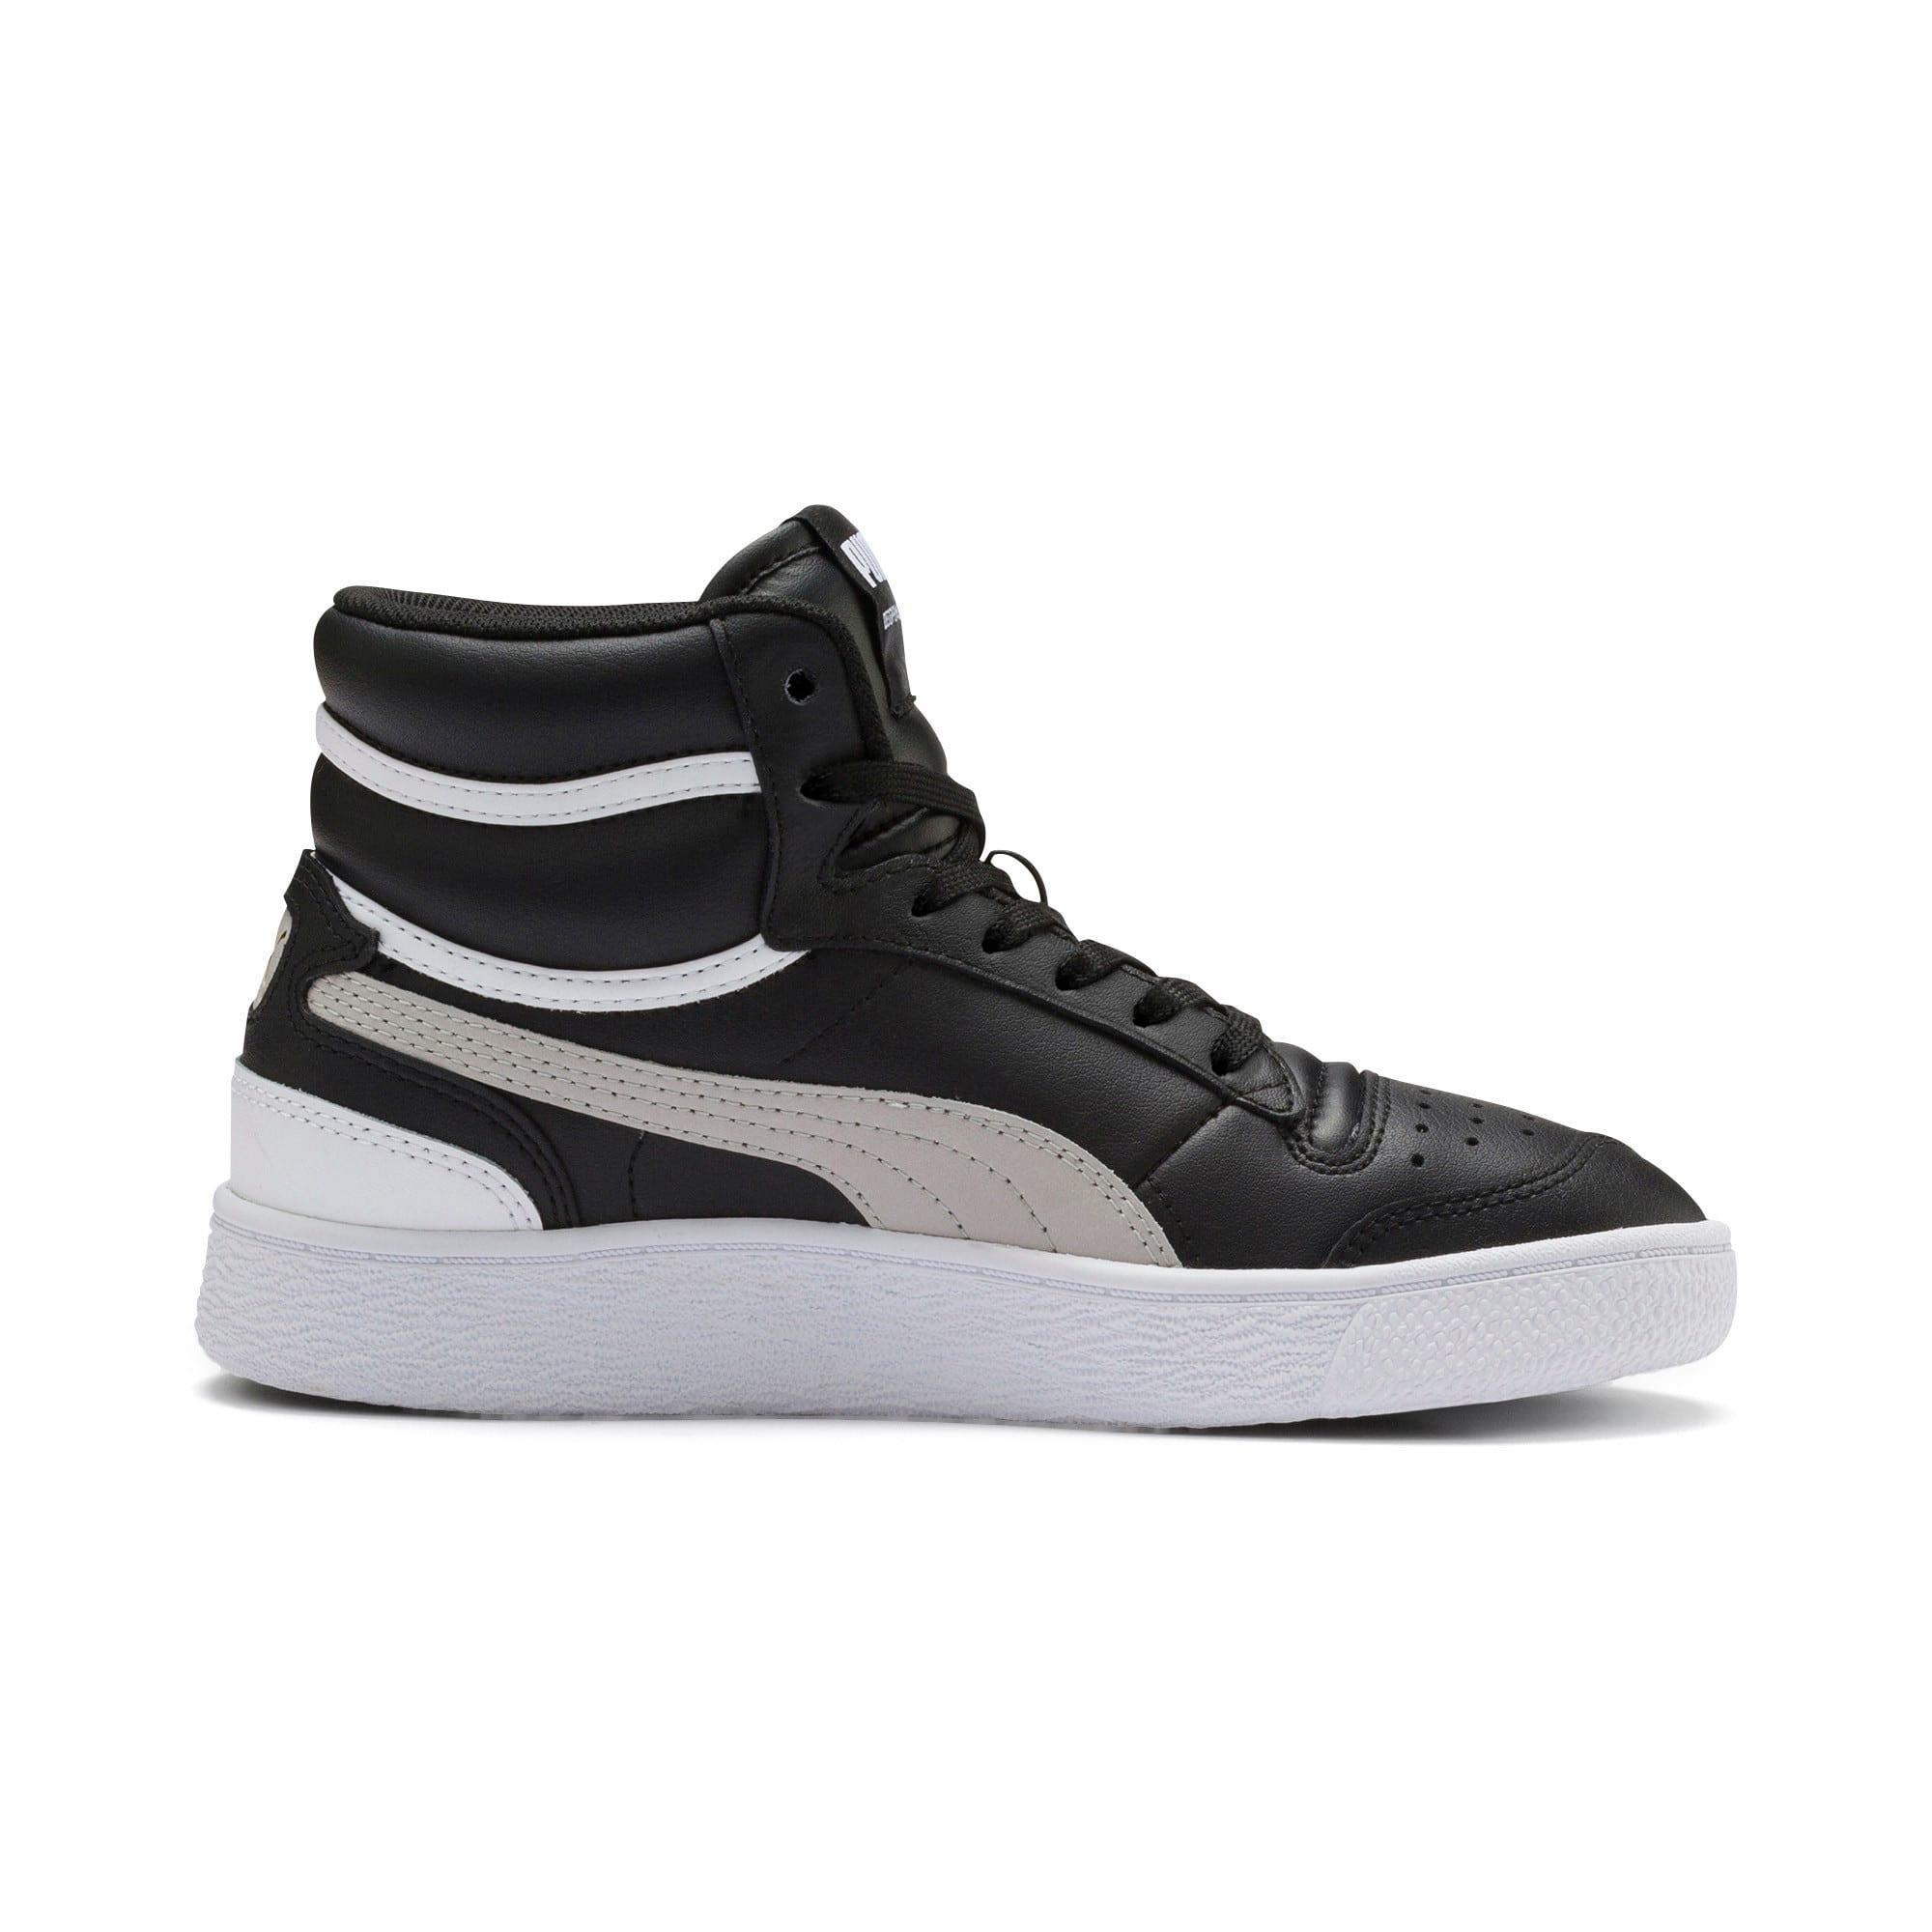 Thumbnail 5 of Ralph Sampson Mid Youth Sneaker, Black-Gray Violet-White, medium